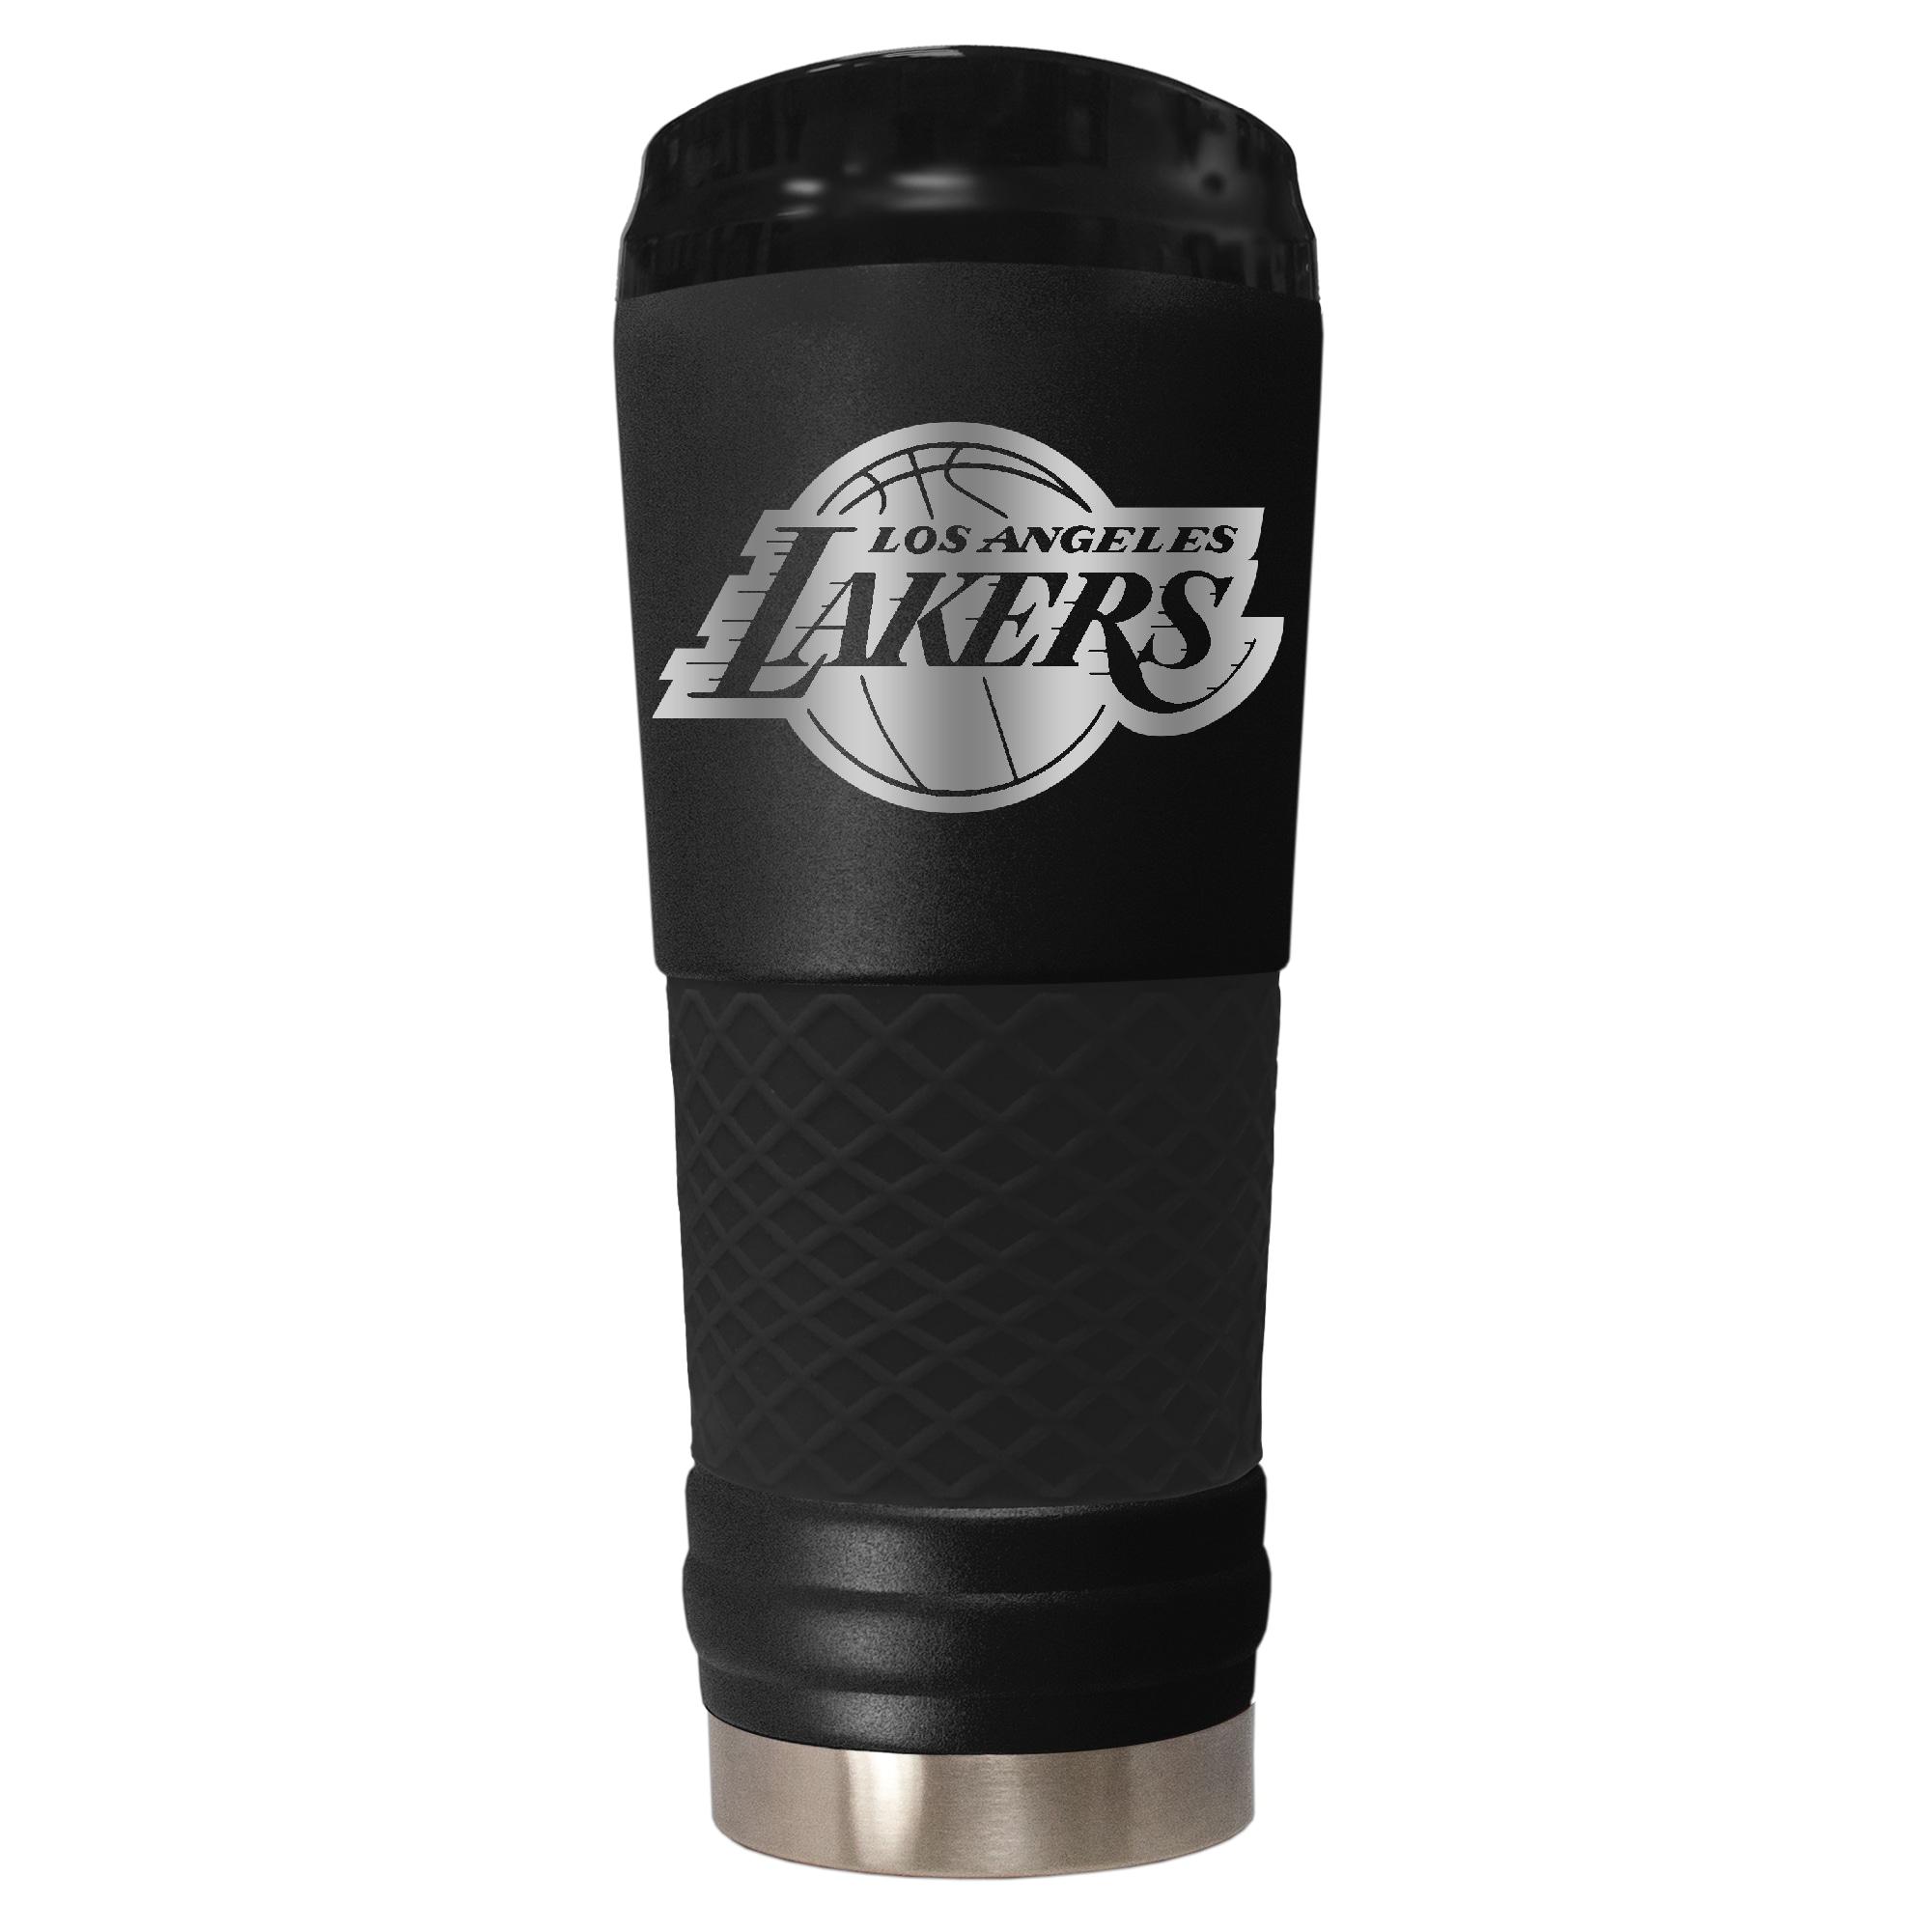 Los Angeles Lakers 18oz. Stealth Draft Tumbler